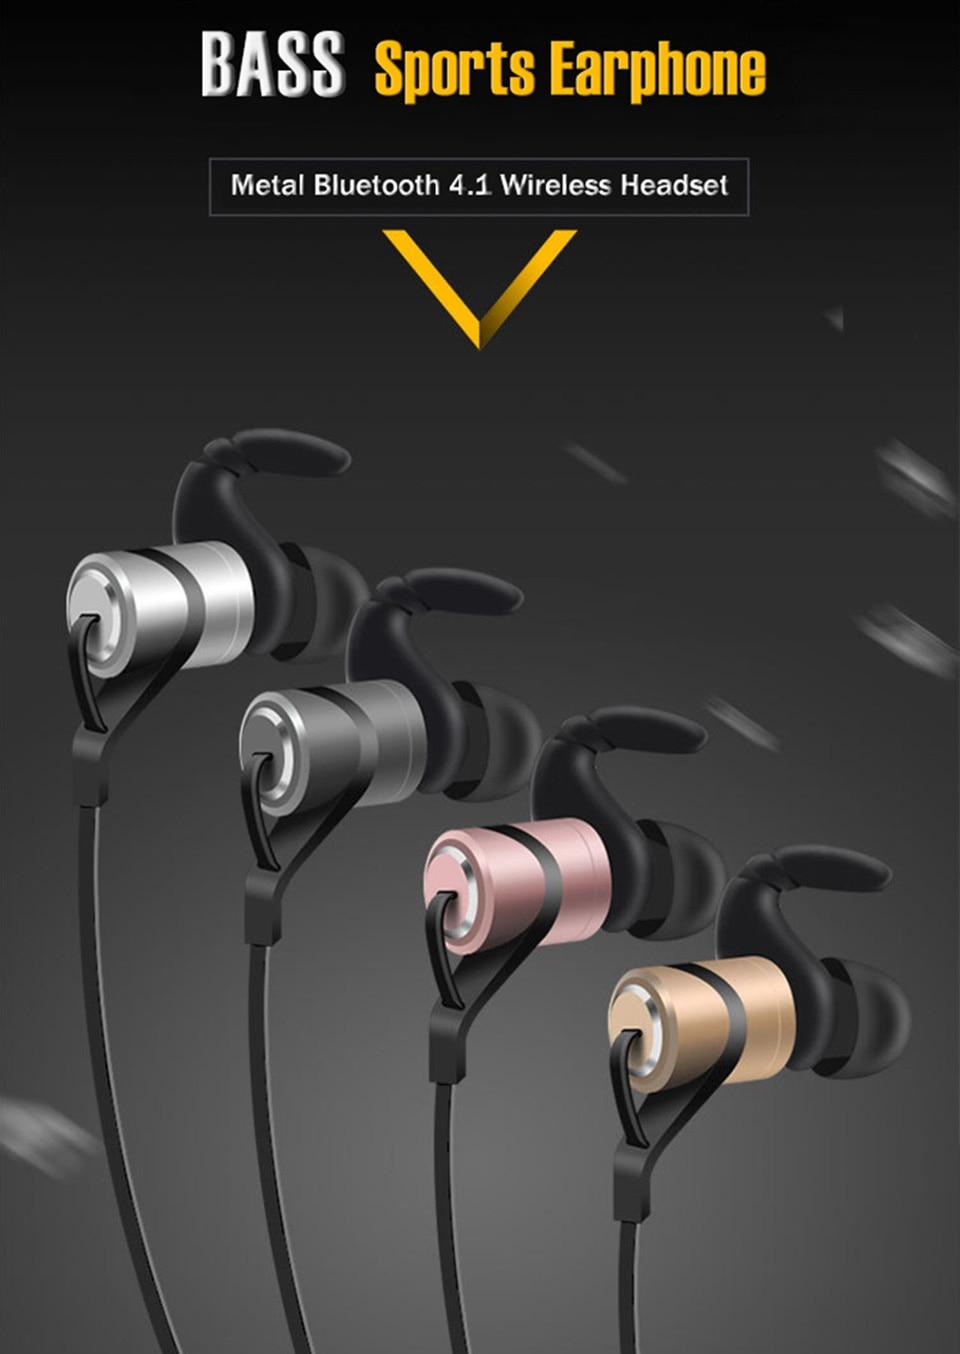 LEPHEE Sport Earphone Hifi Wireless Earphones Bluetooth Super Bass Earbuds with Mic Noise Cancelling Headset for Xiaomi Mi Phone